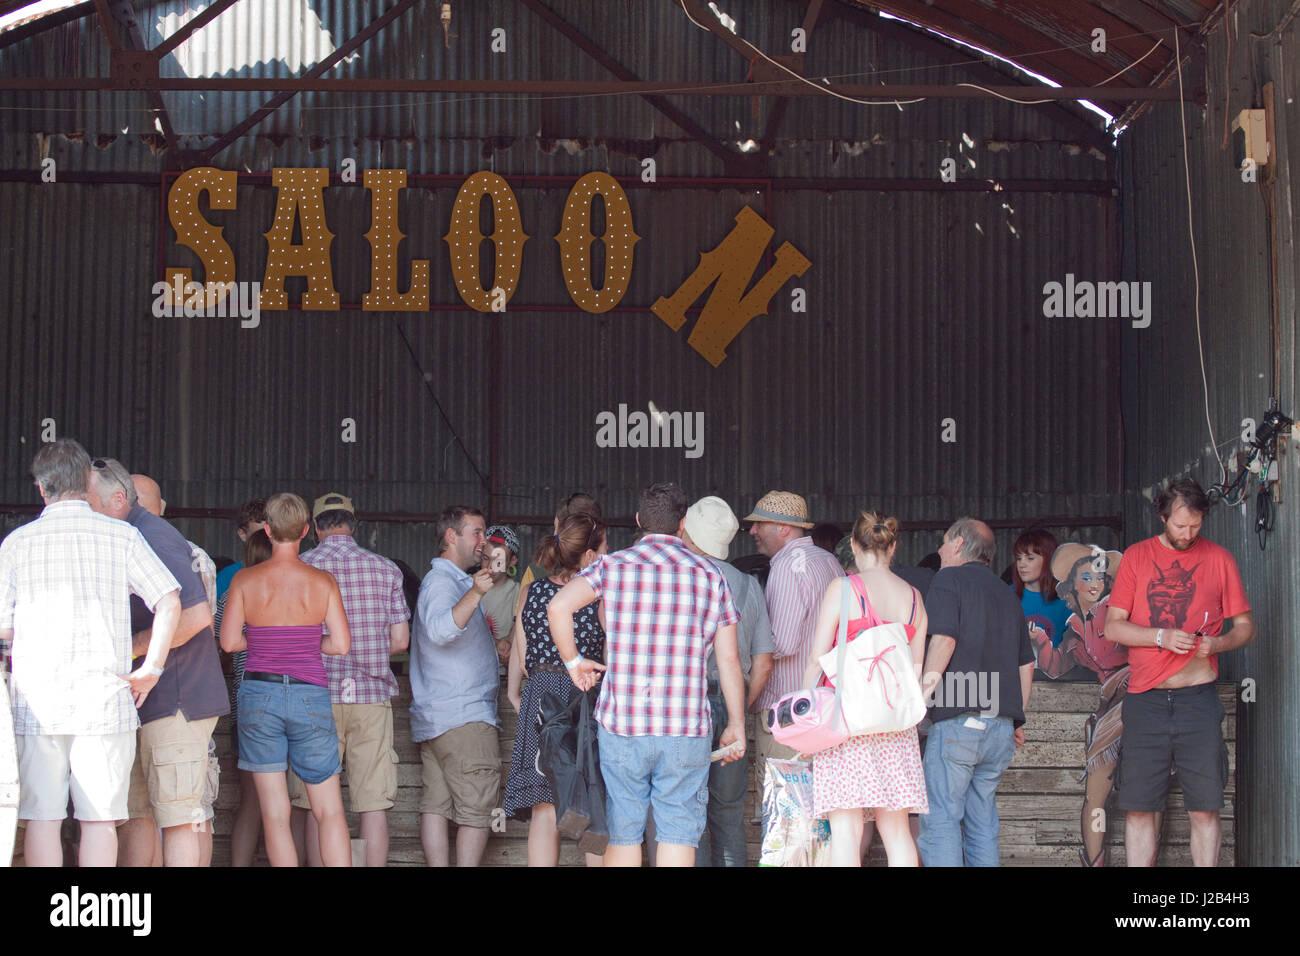 The bar at the Maverick music festival - Stock Image